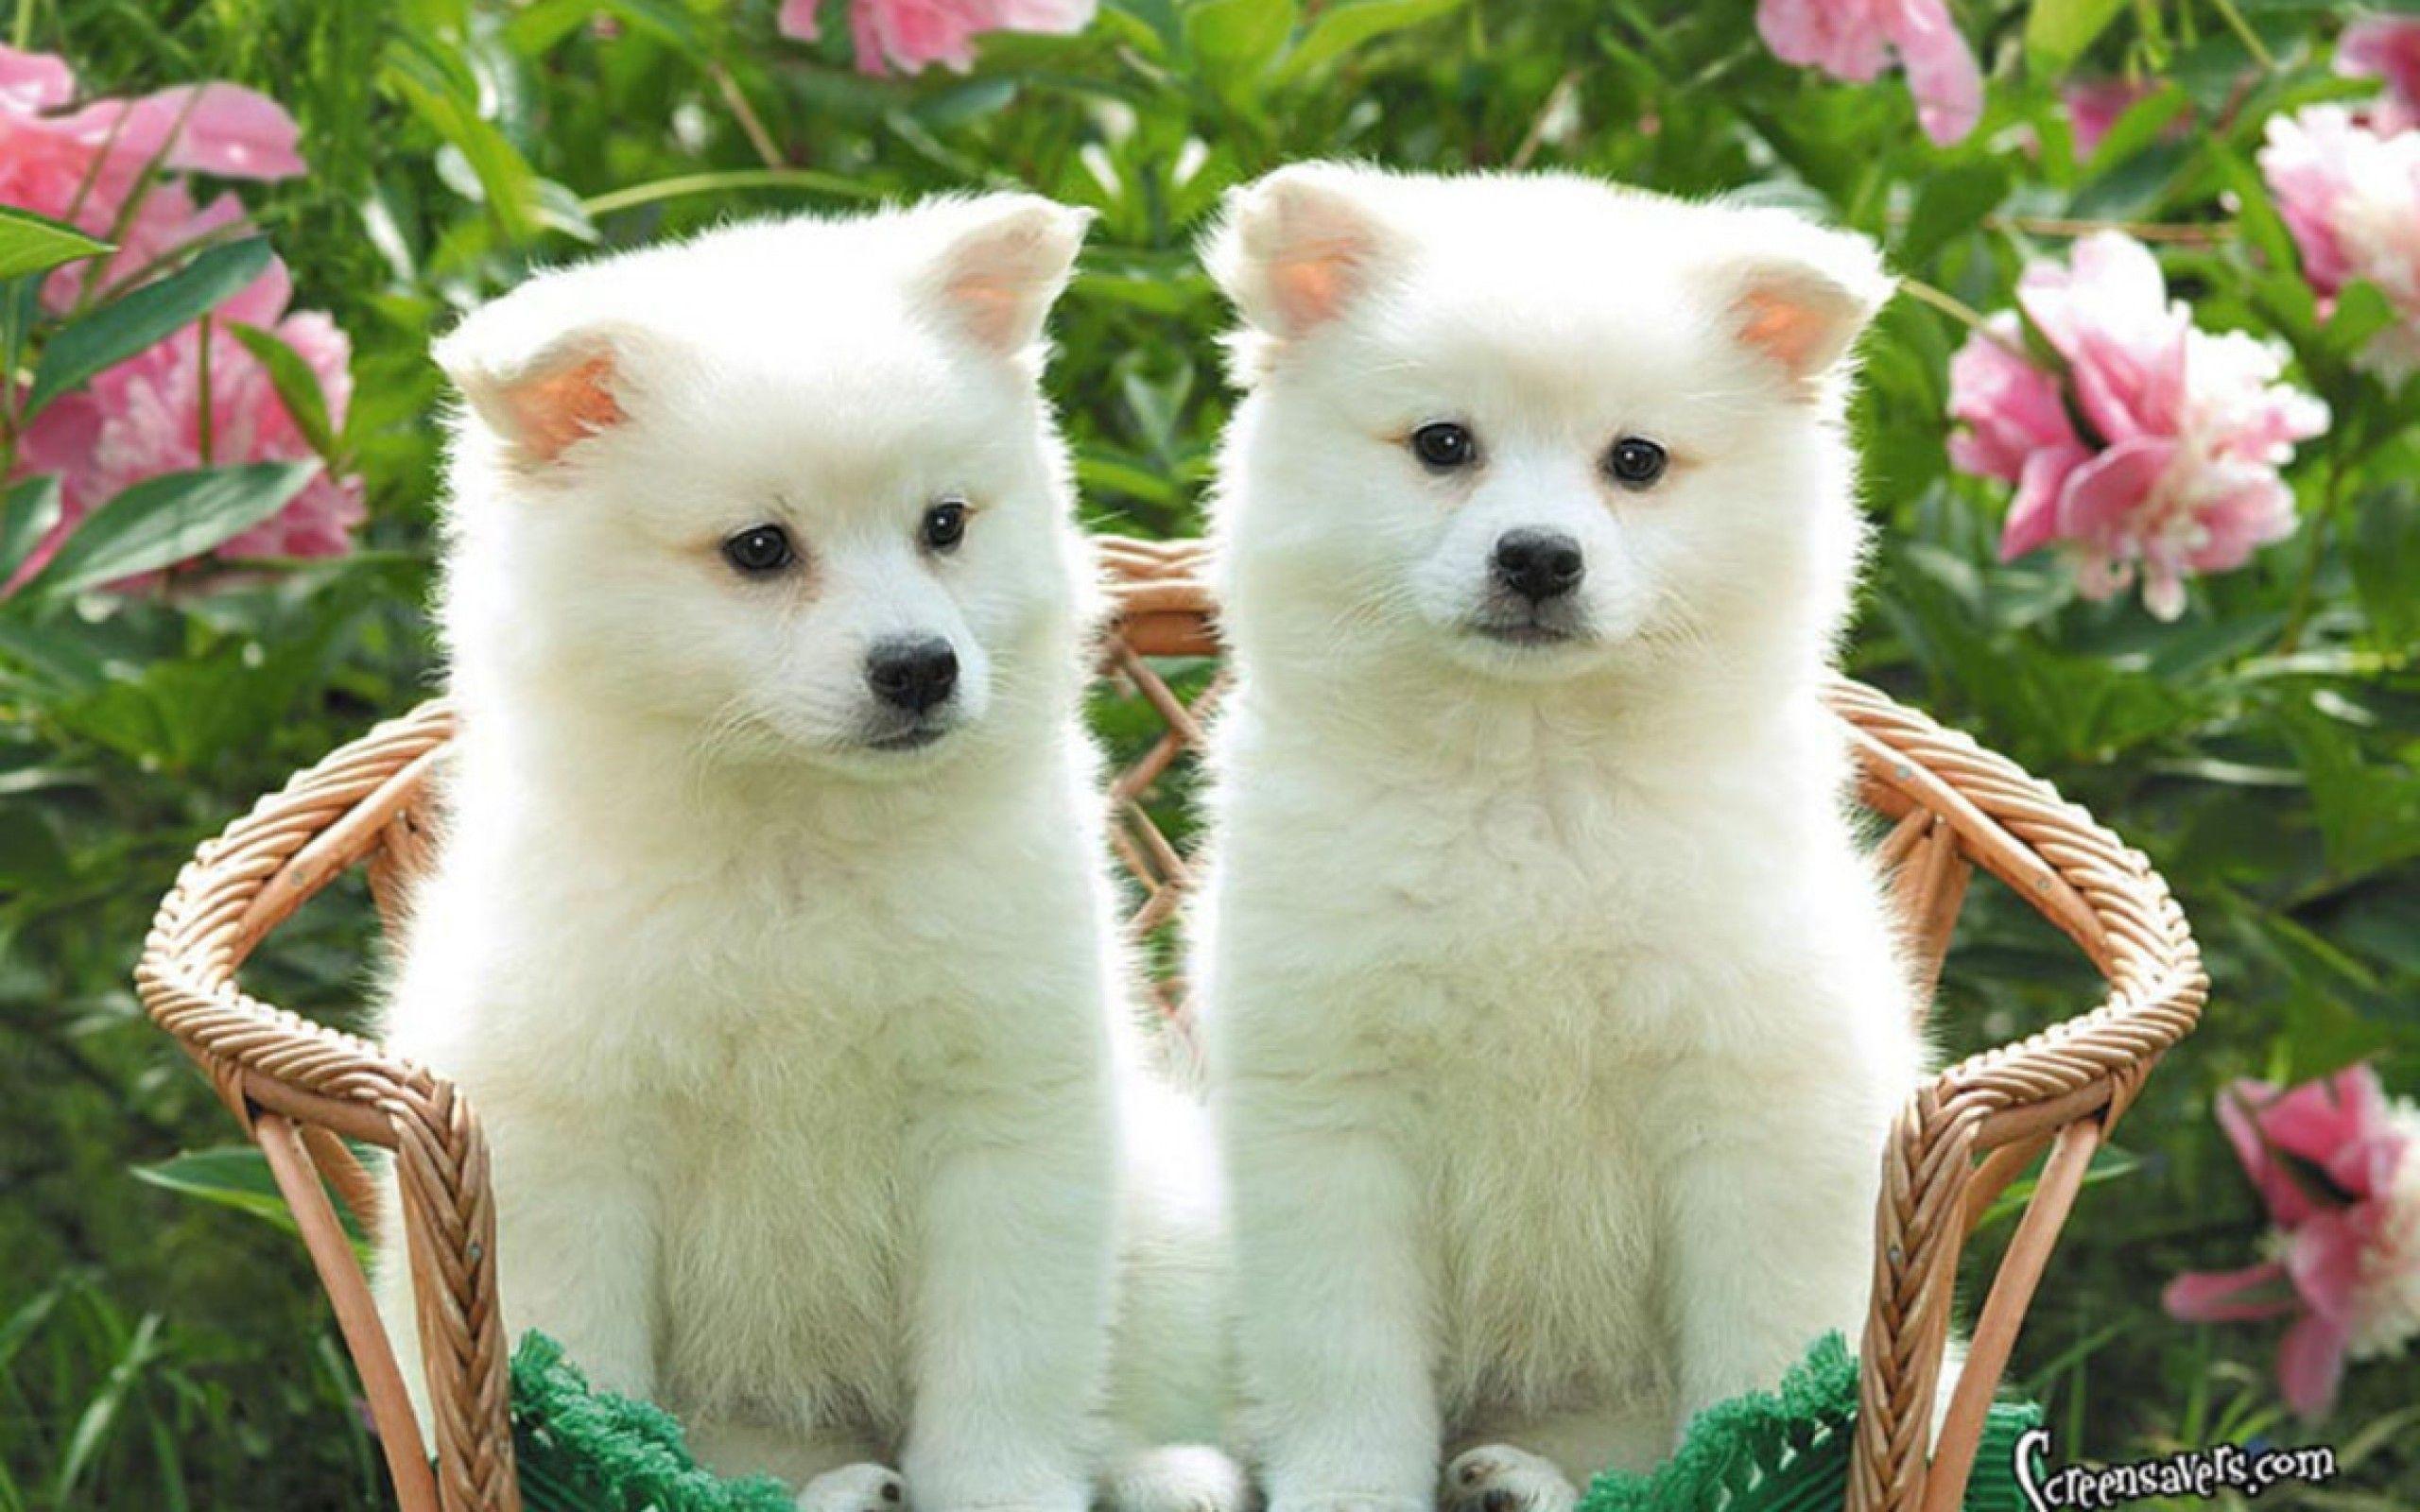 Wallpapers For > Cute Puppy Desktop Wallpaper